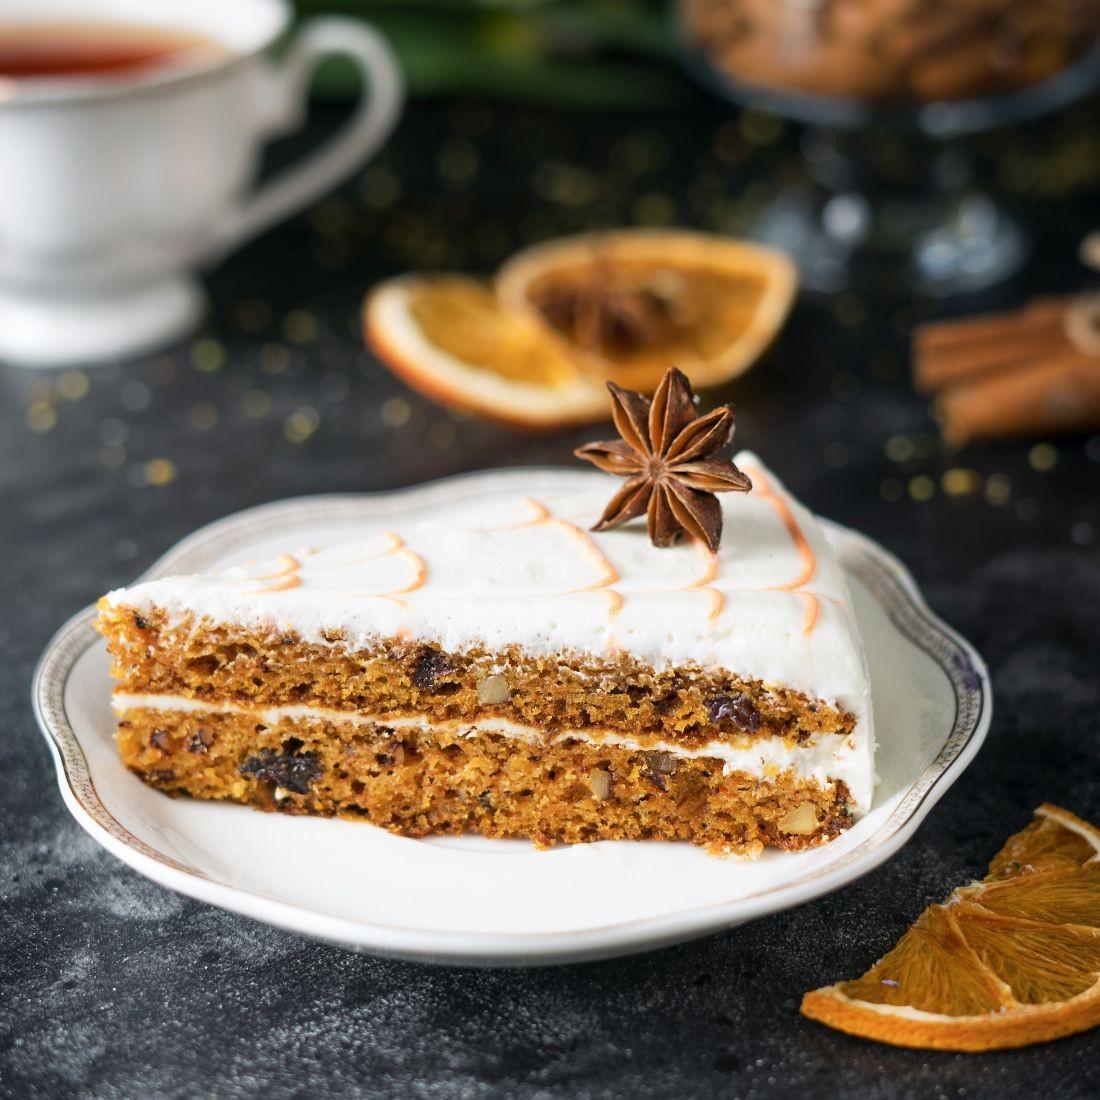 Торт морковный (Эко-Франс)